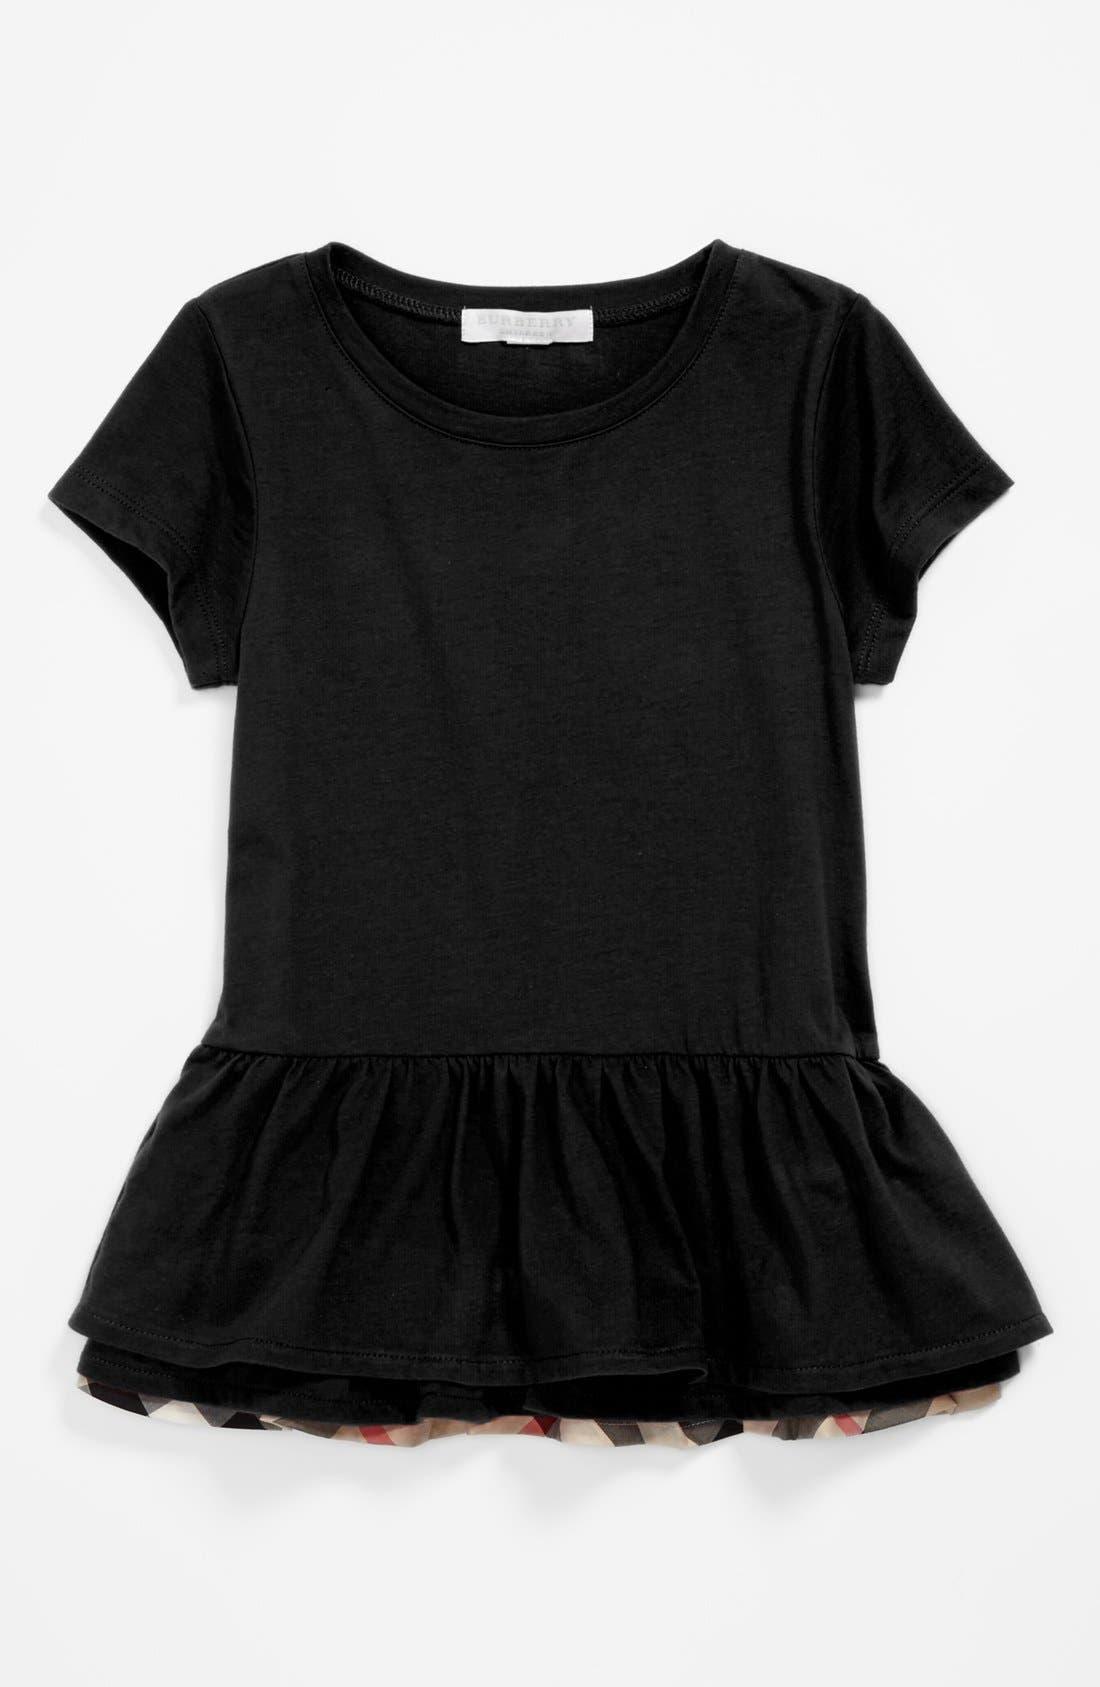 Main Image - Burberry 'Tyna' Tiered Ruffle Hem Top (Toddler Girls, Little Girls & Big Girls)